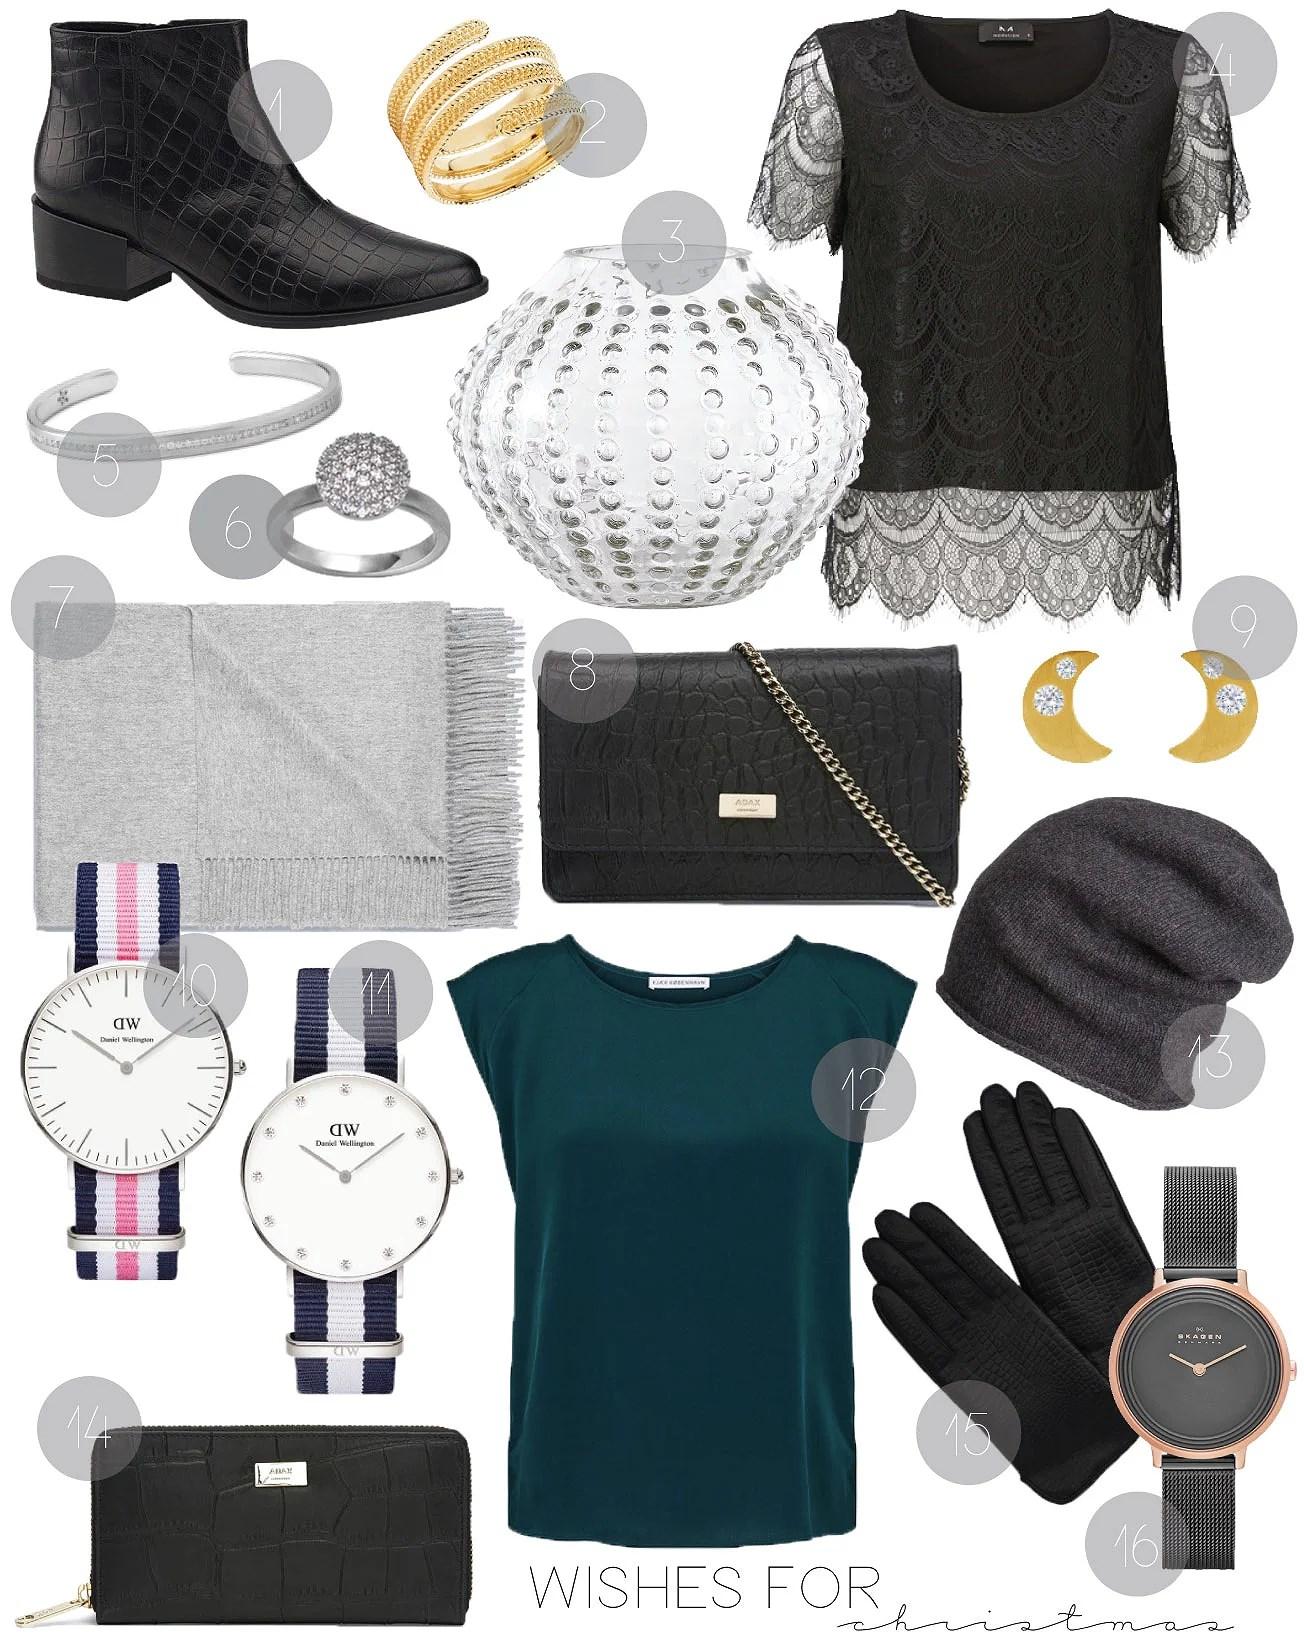 Modeblog, It's My Passions, Juleønsker, Ideer til ønskesedlen